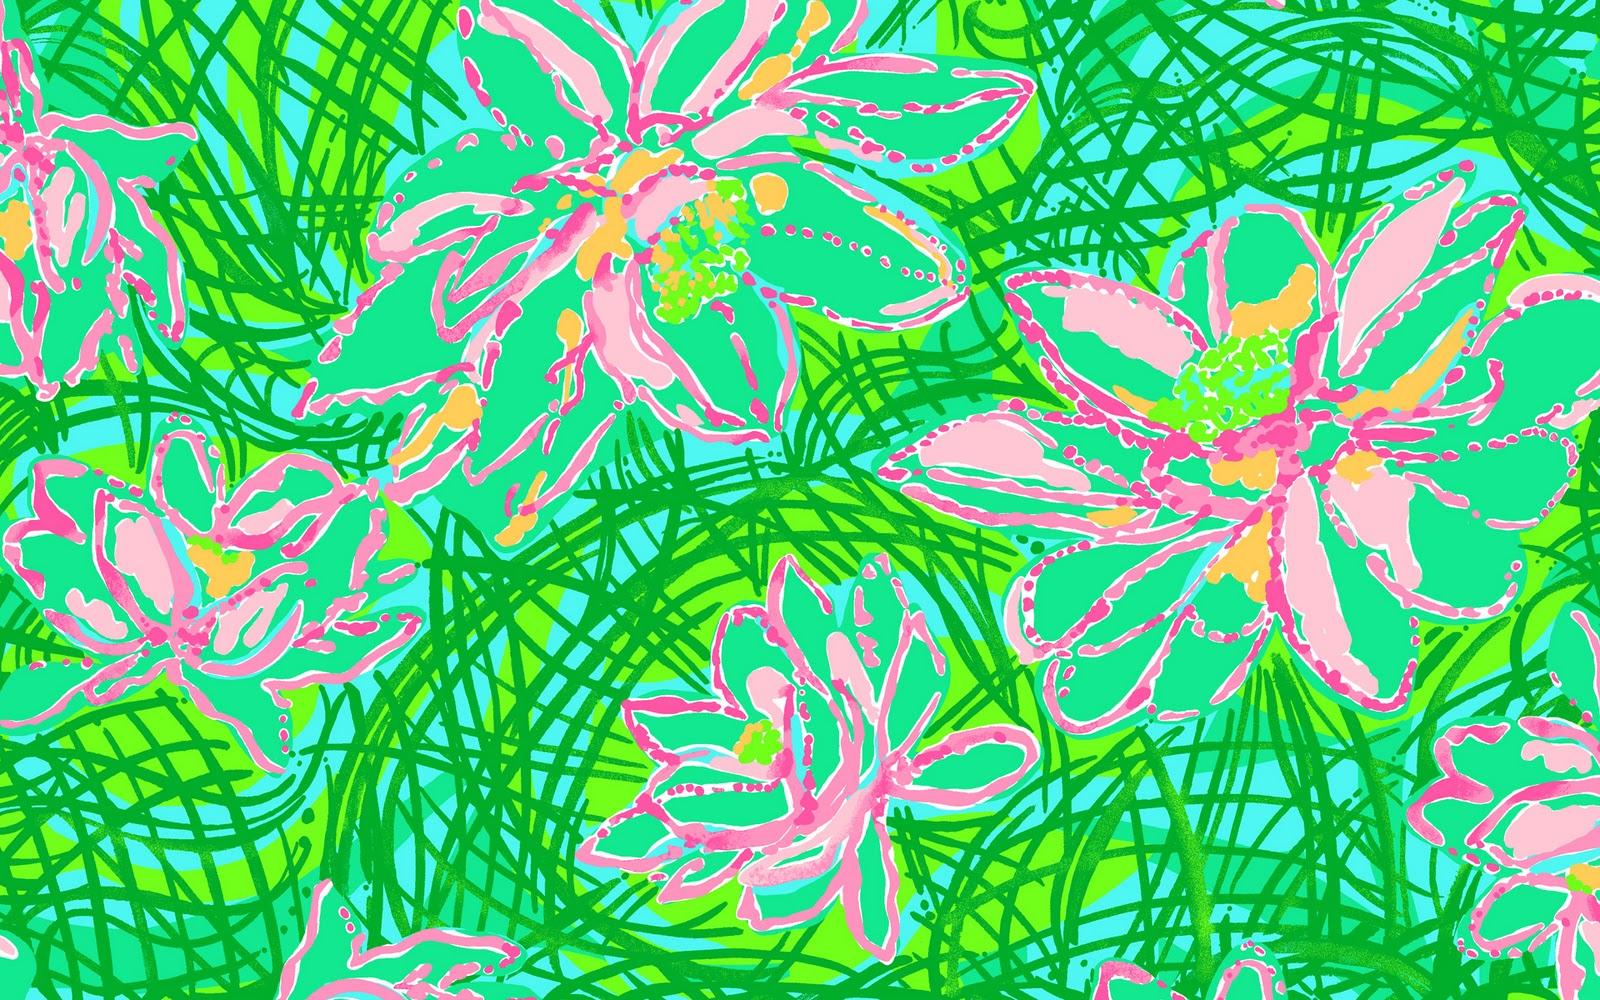 Lily Pulitzer Starbucks Canadianprep Lilly Desktop Wallpaper